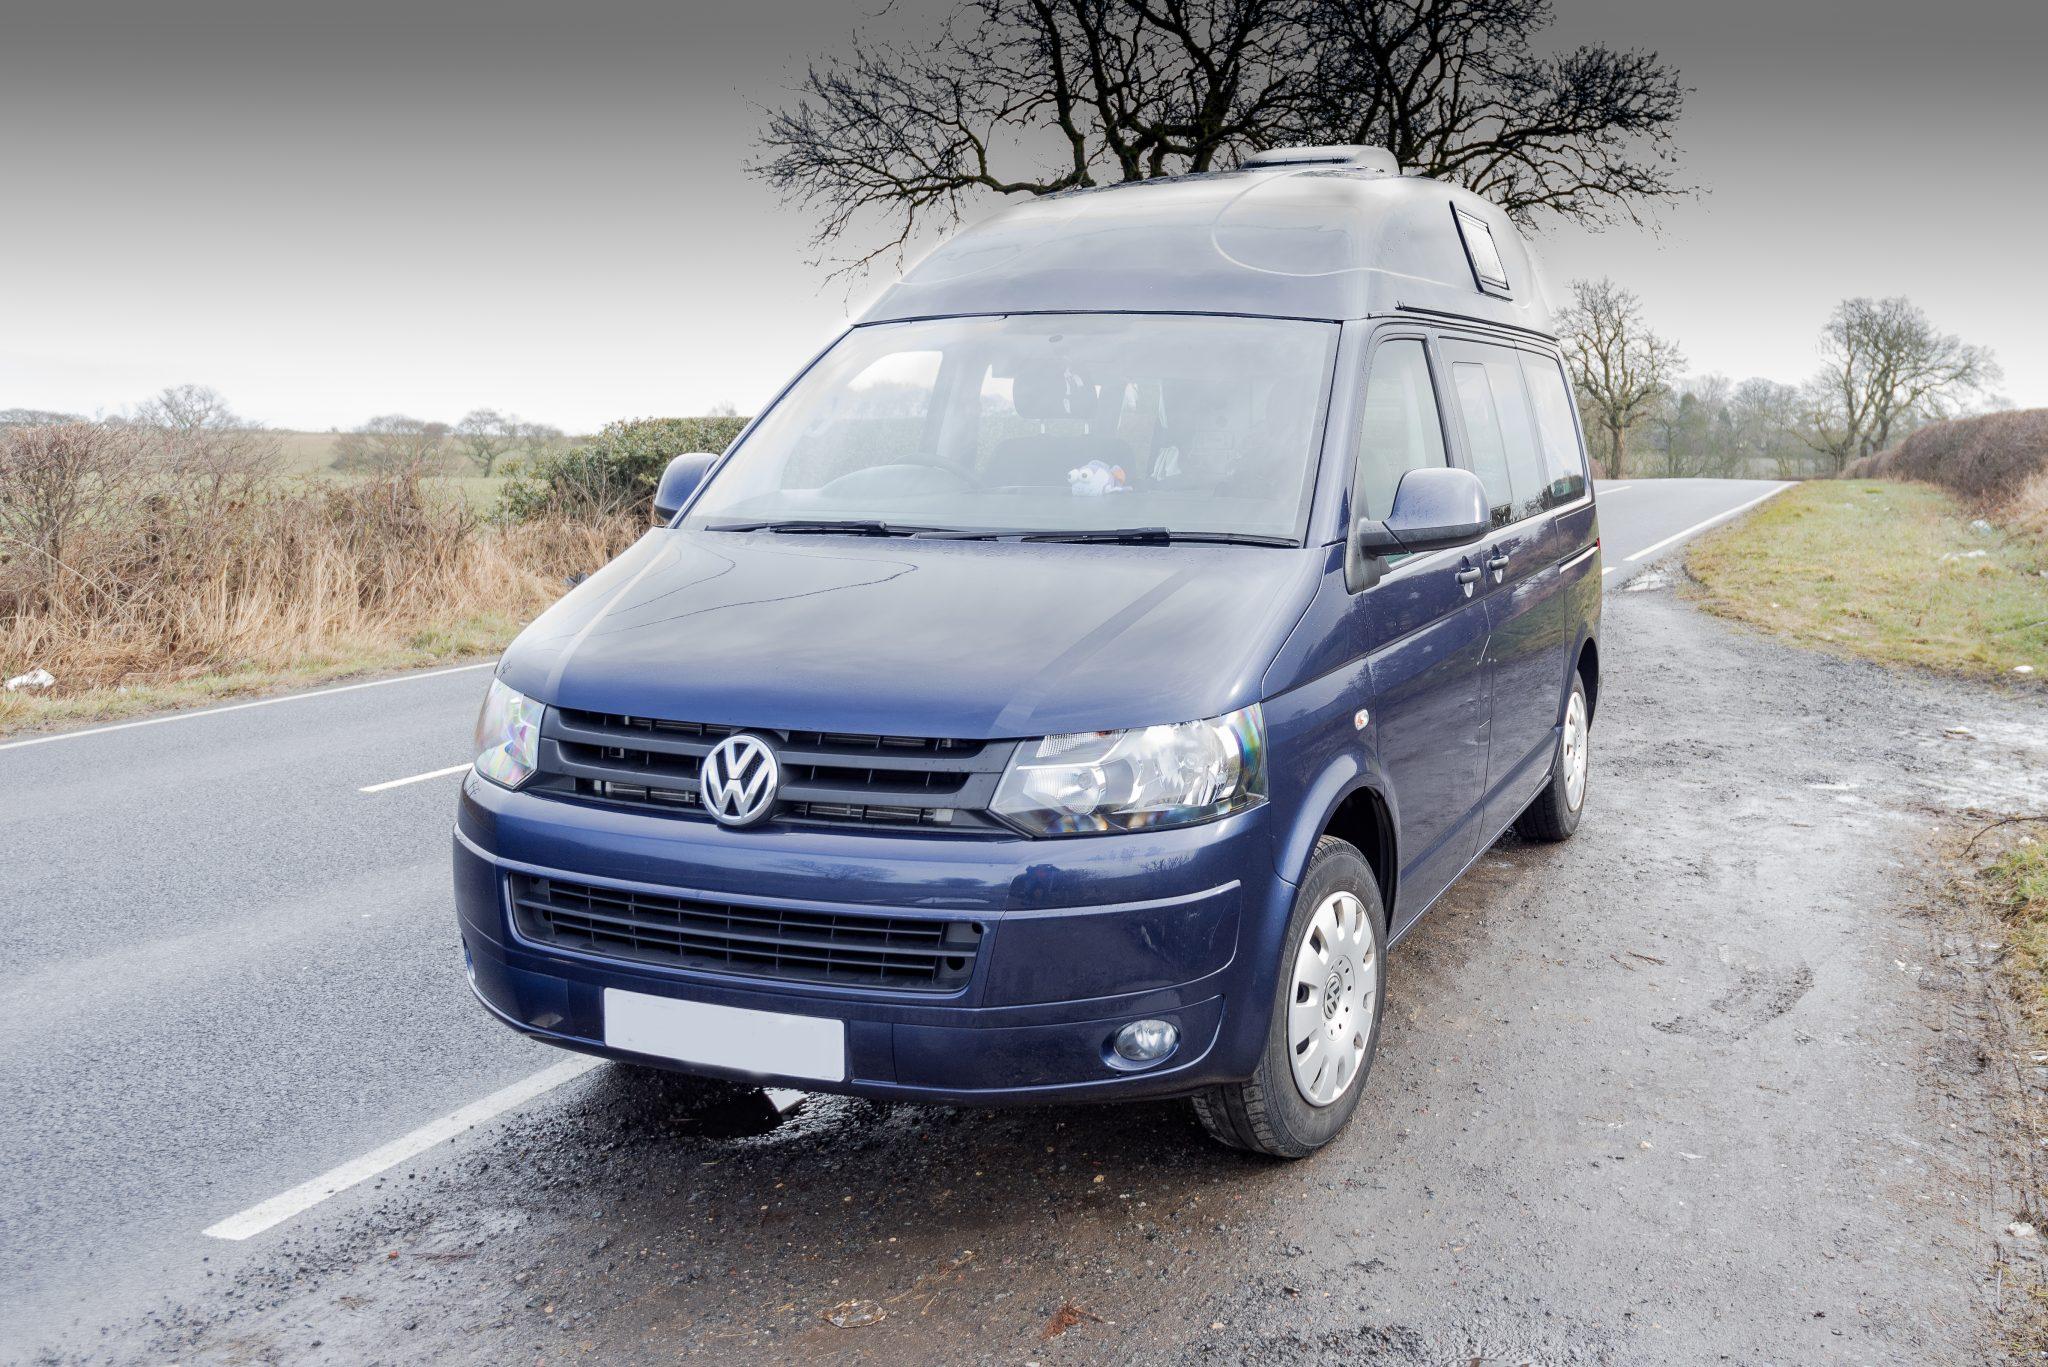 high top SWB van for sale